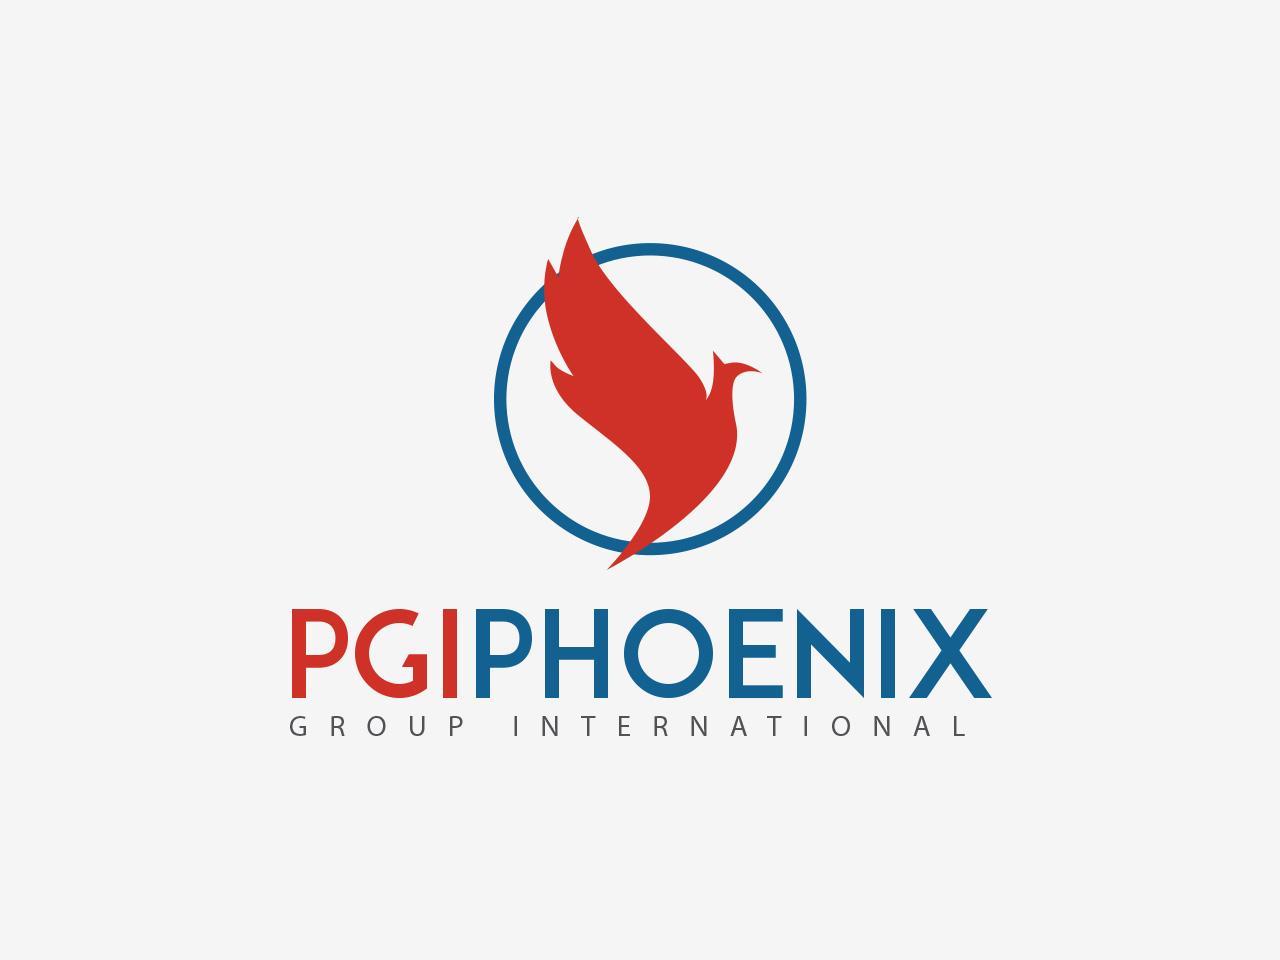 Imagen de PGI Phoenix Group Colombia por Movidagrafica